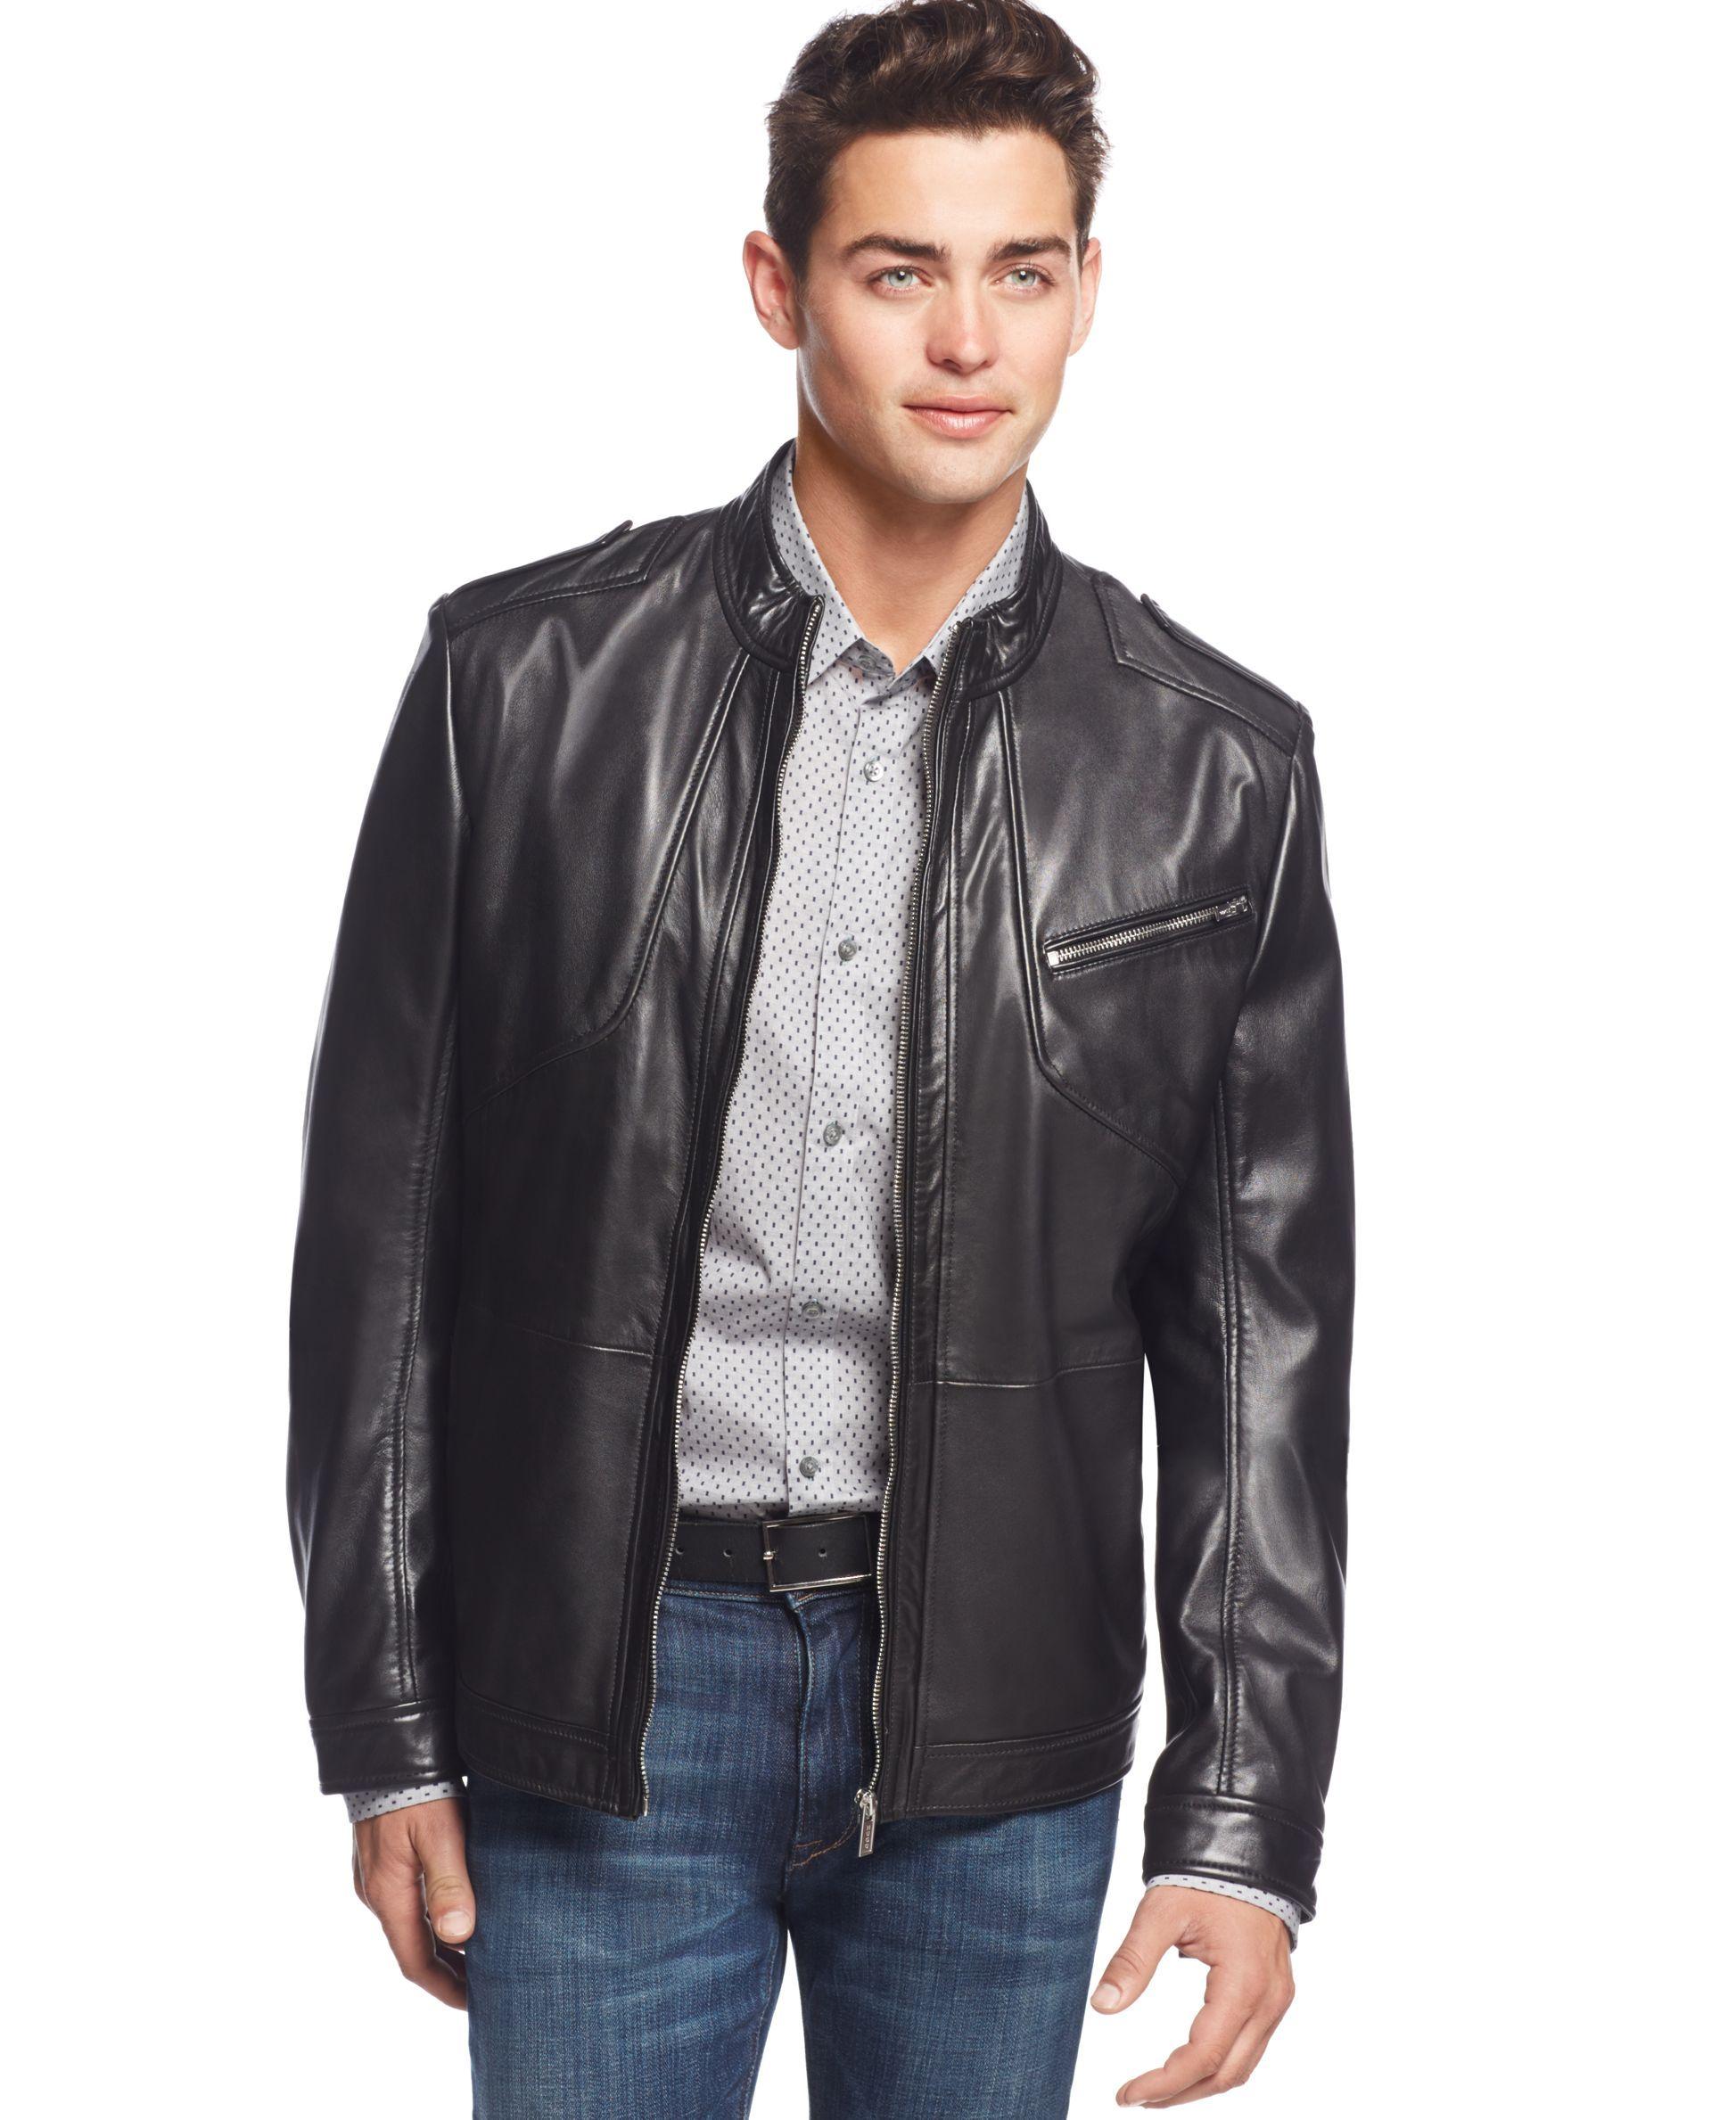 Boss Hugo Boss Lanex Leather Jacket Leather jeans men